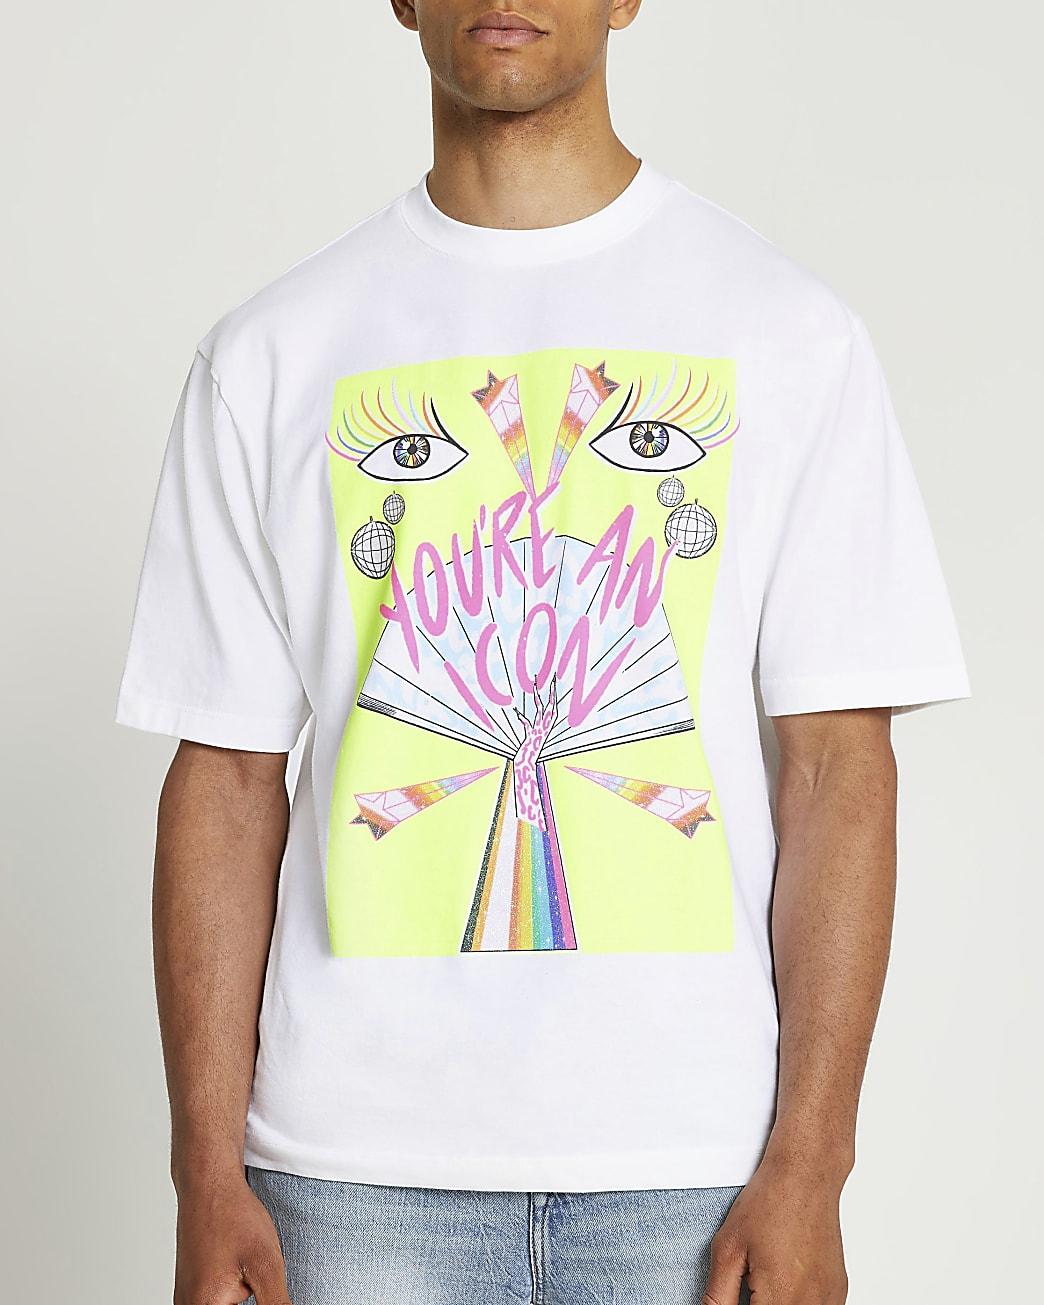 RI x DOM&INK Pride unisex white t-shirt